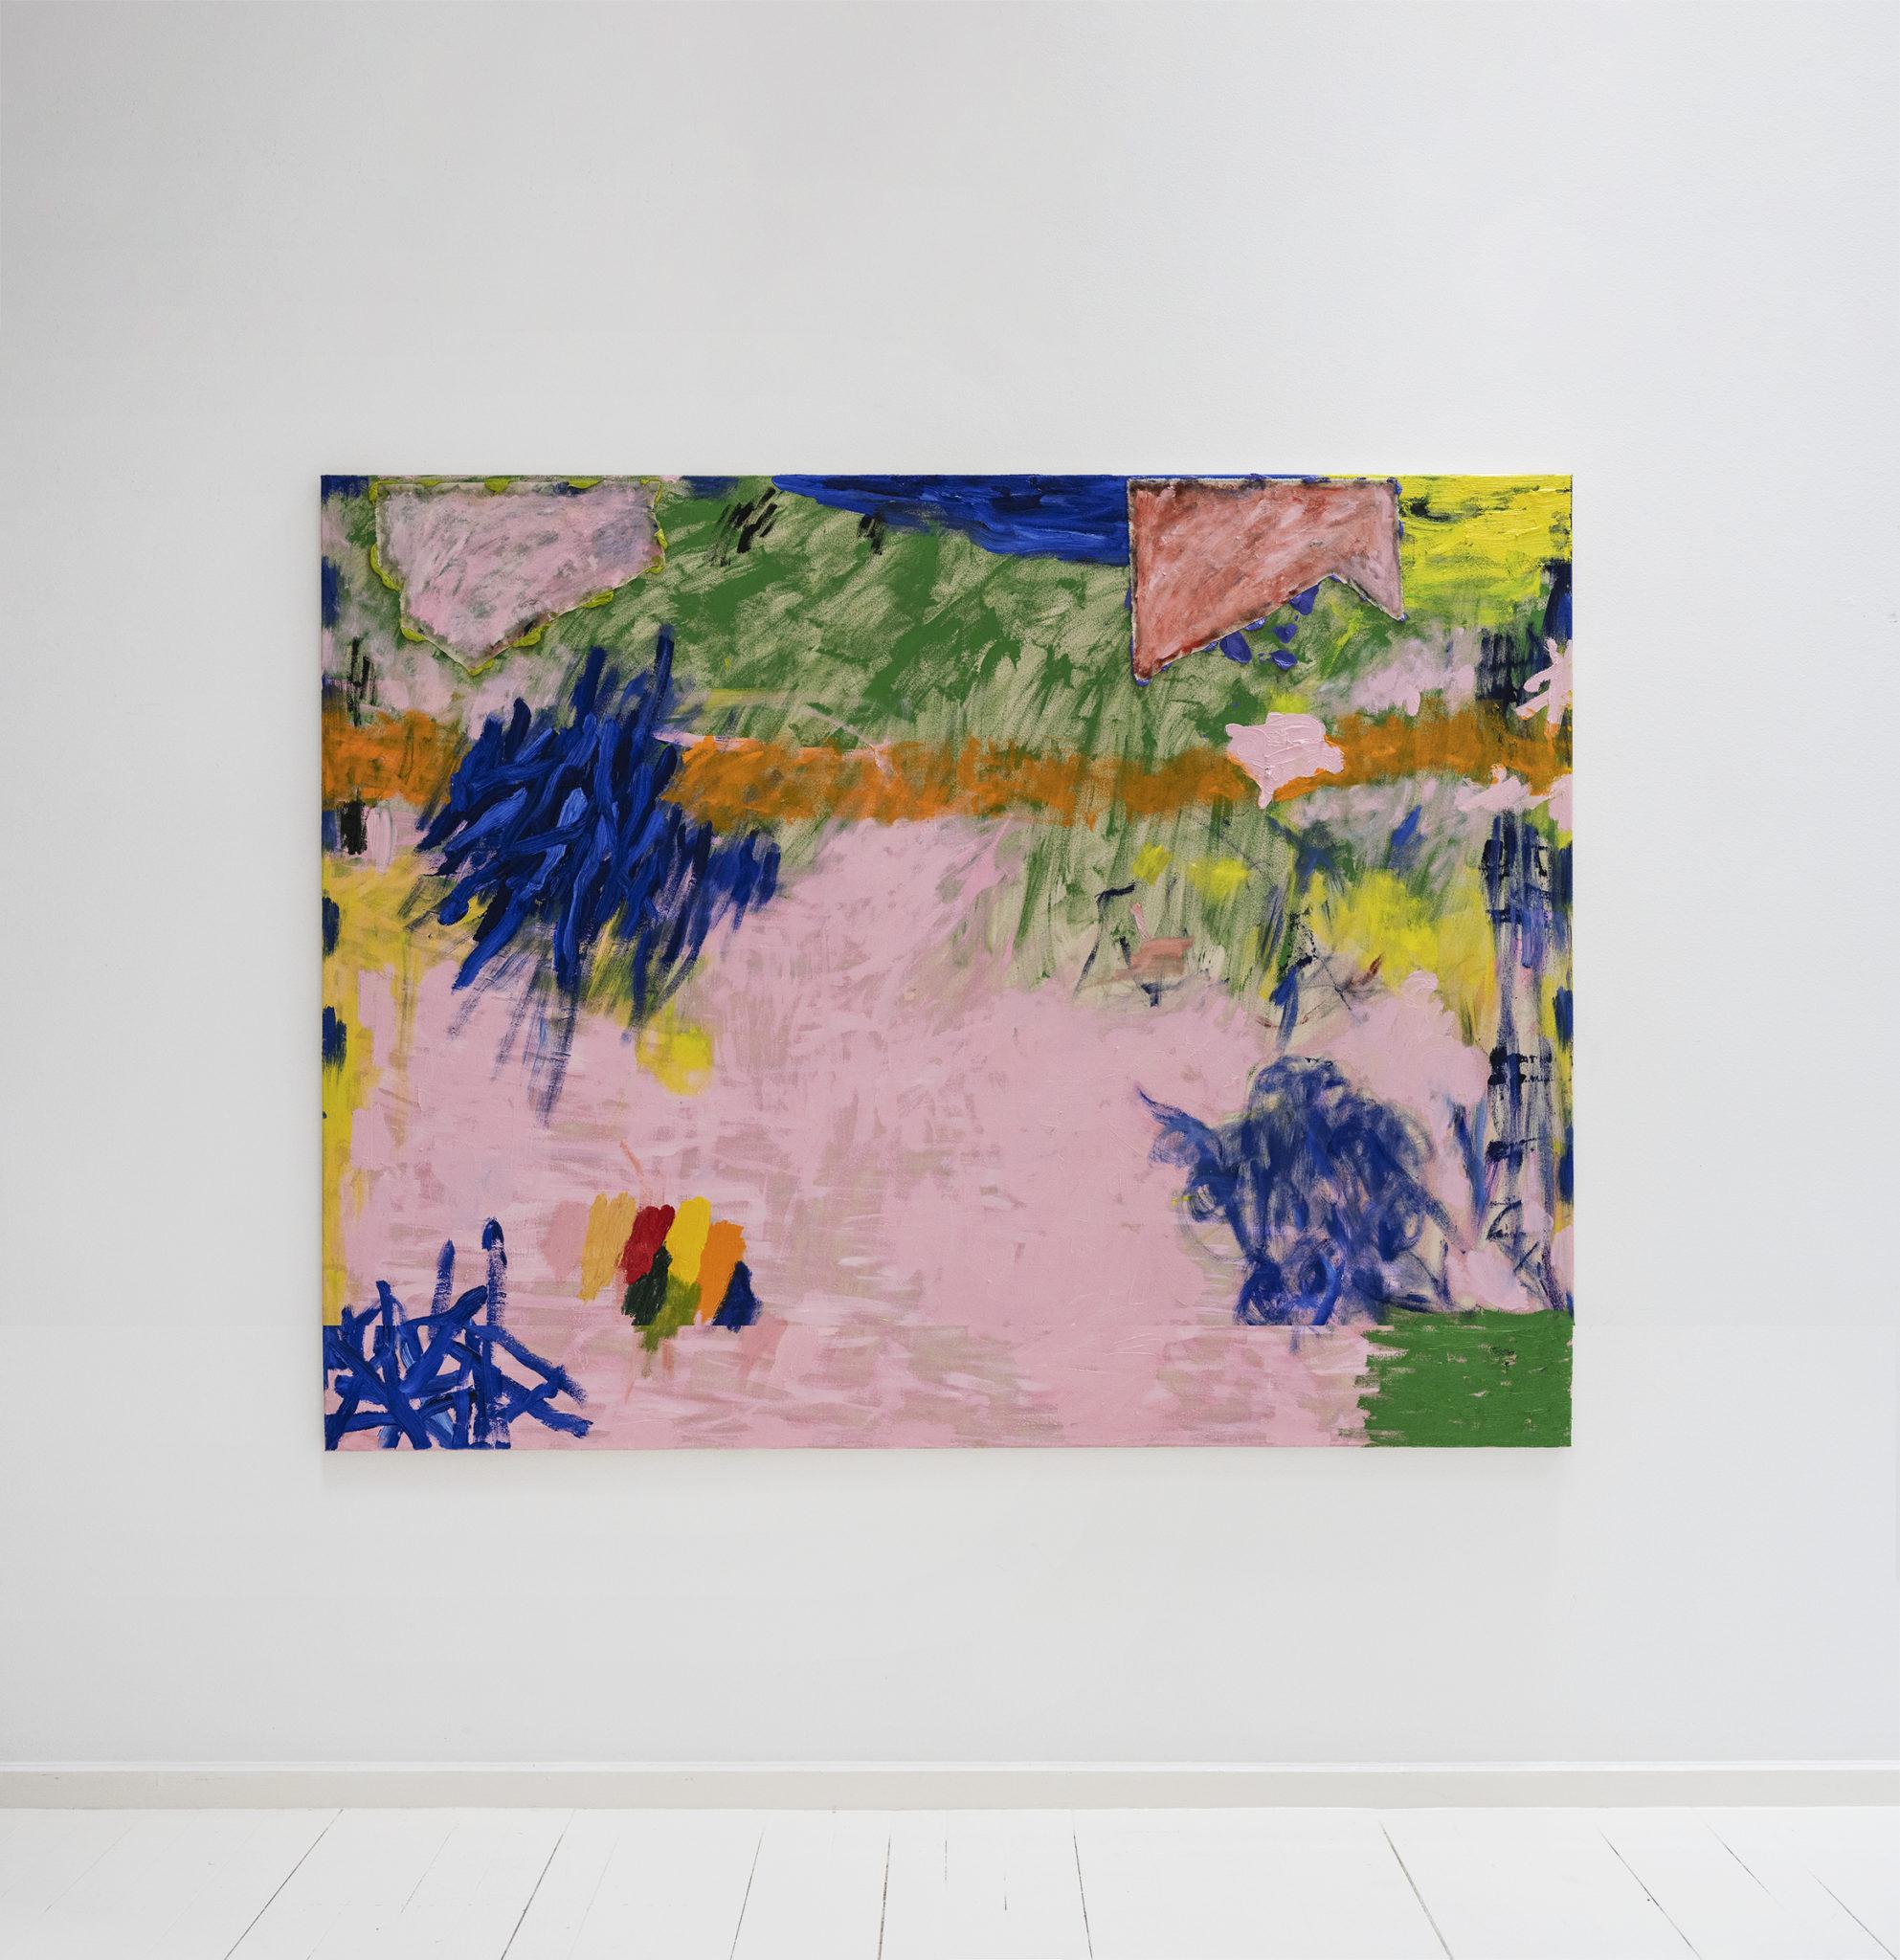 Daisy Parris Artworks Alzueta Gallery